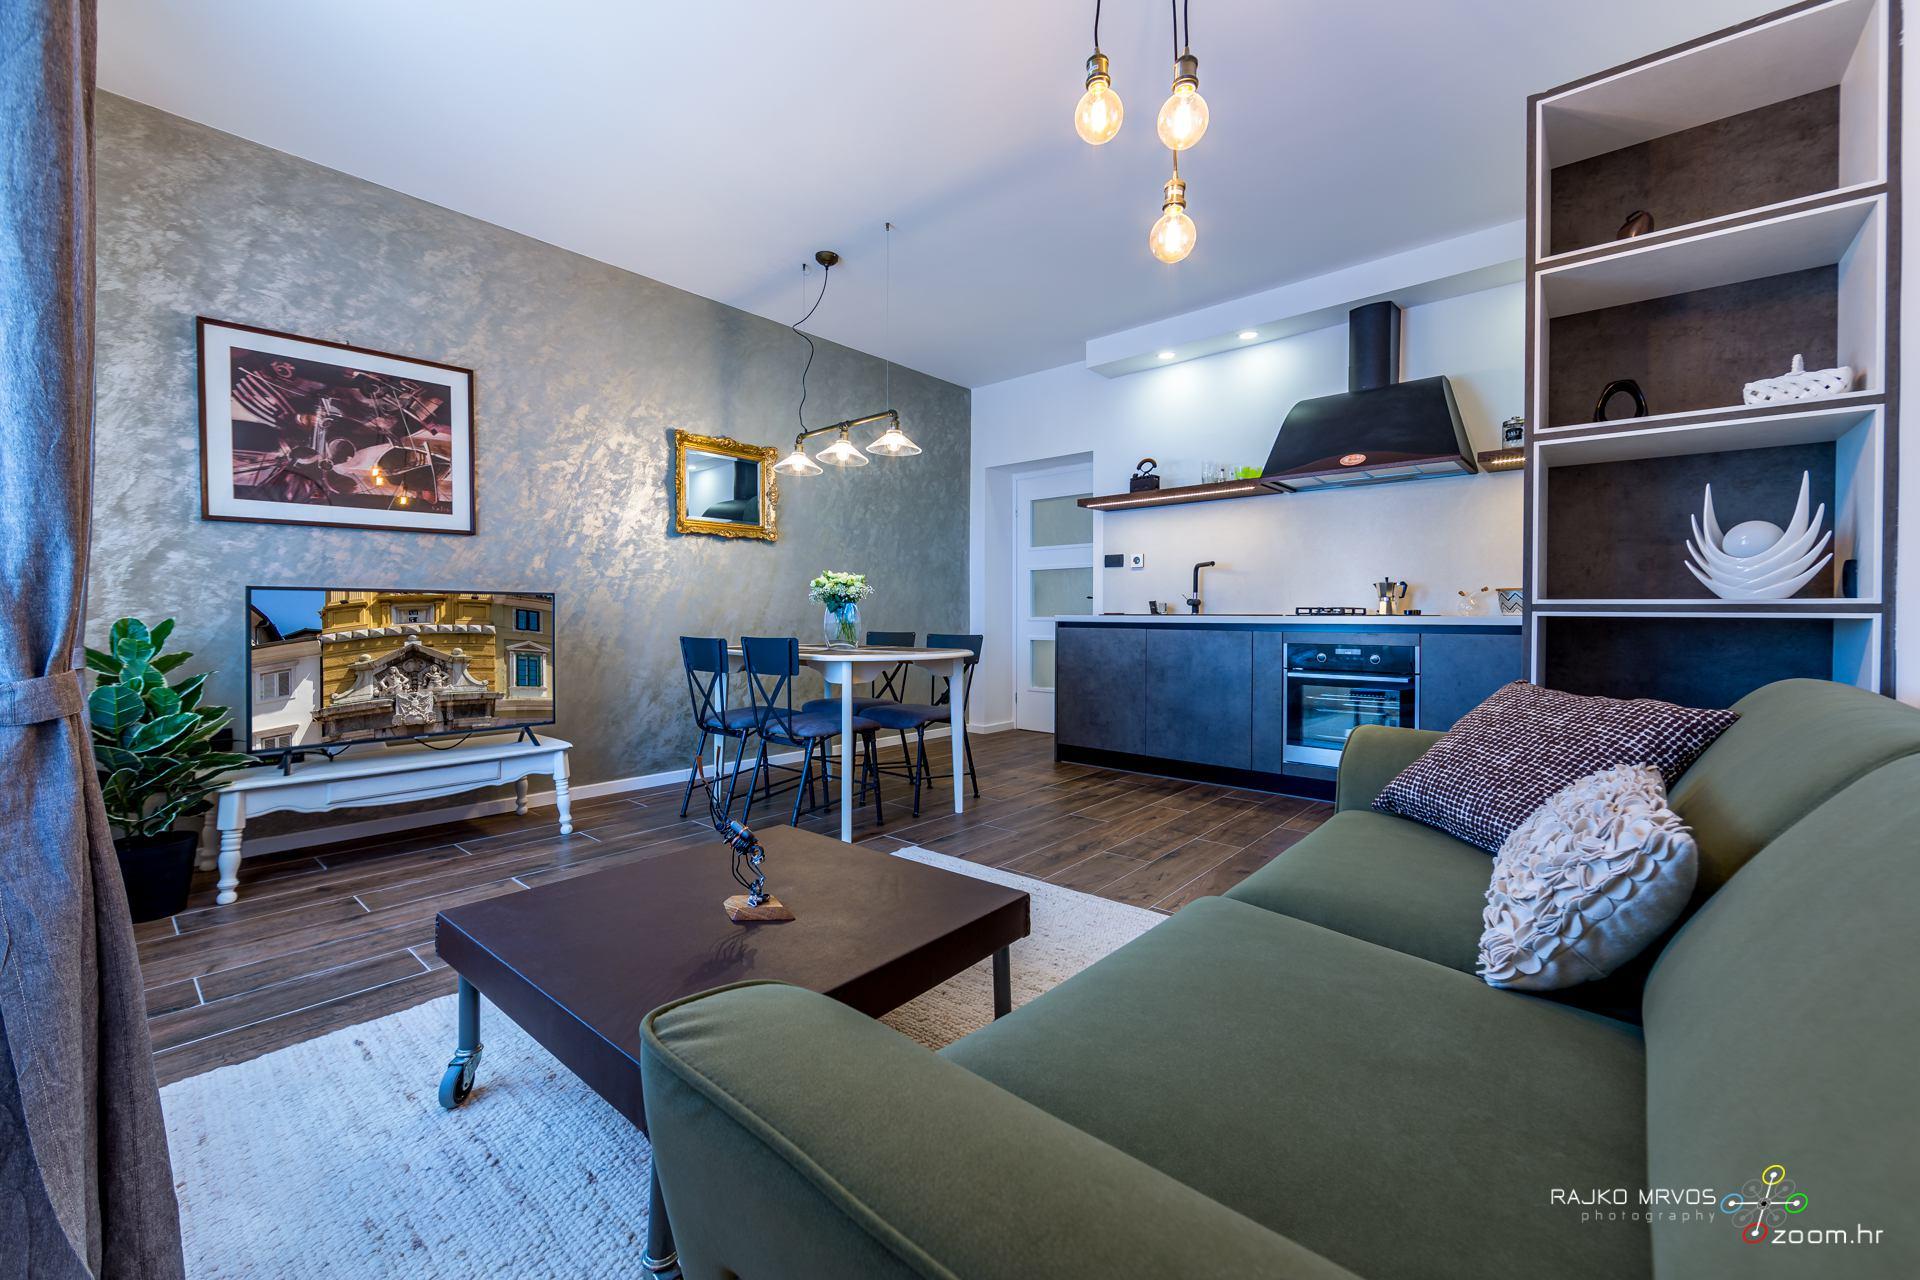 profesionalno-fotografiranje-interijera-fotograf-apartmana-apartman-Apartman-Dora-Rijeka-12